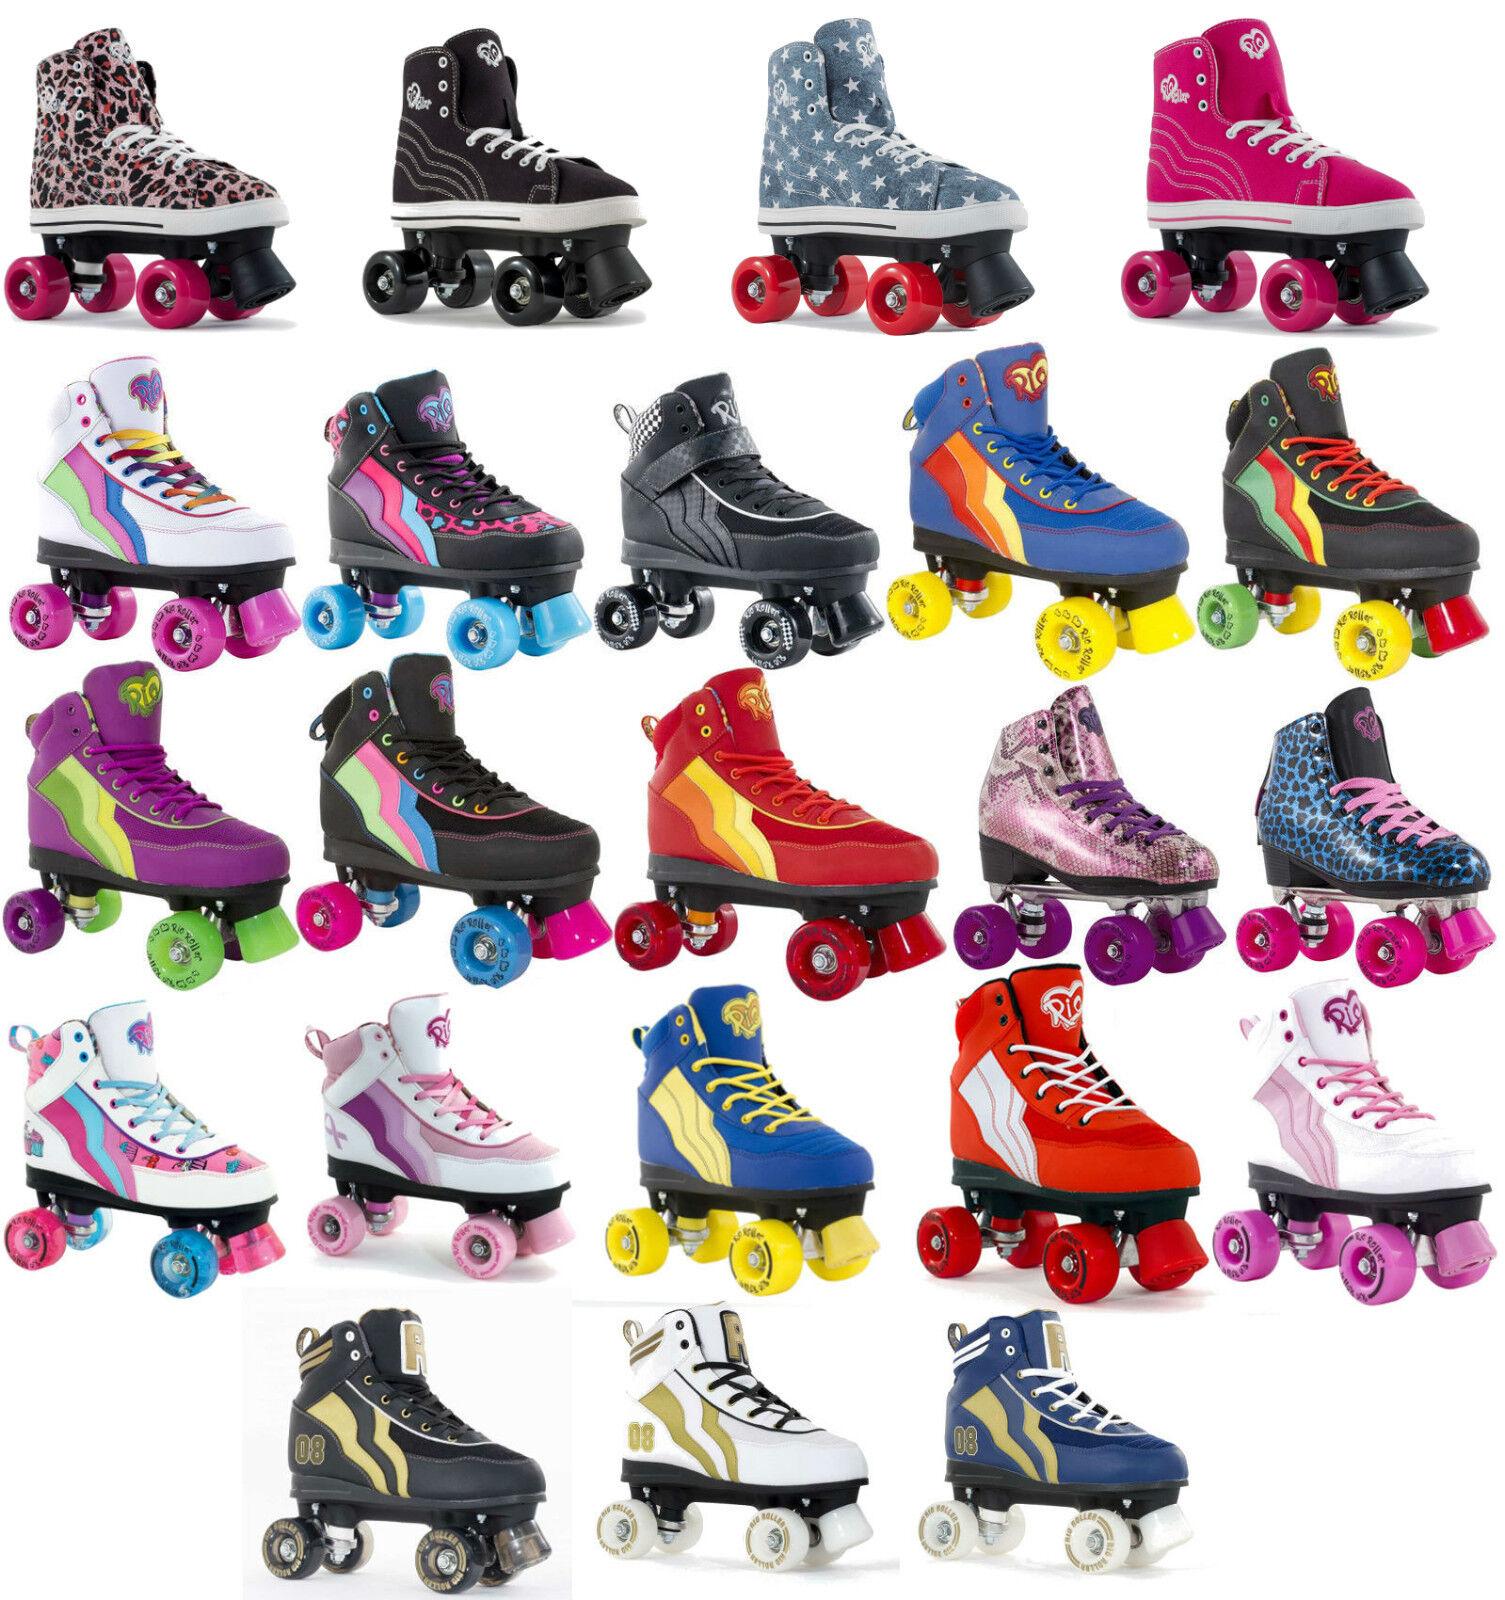 Roller shoes london - Sfr Rio Roller Quad Kids Mens Womens Skates